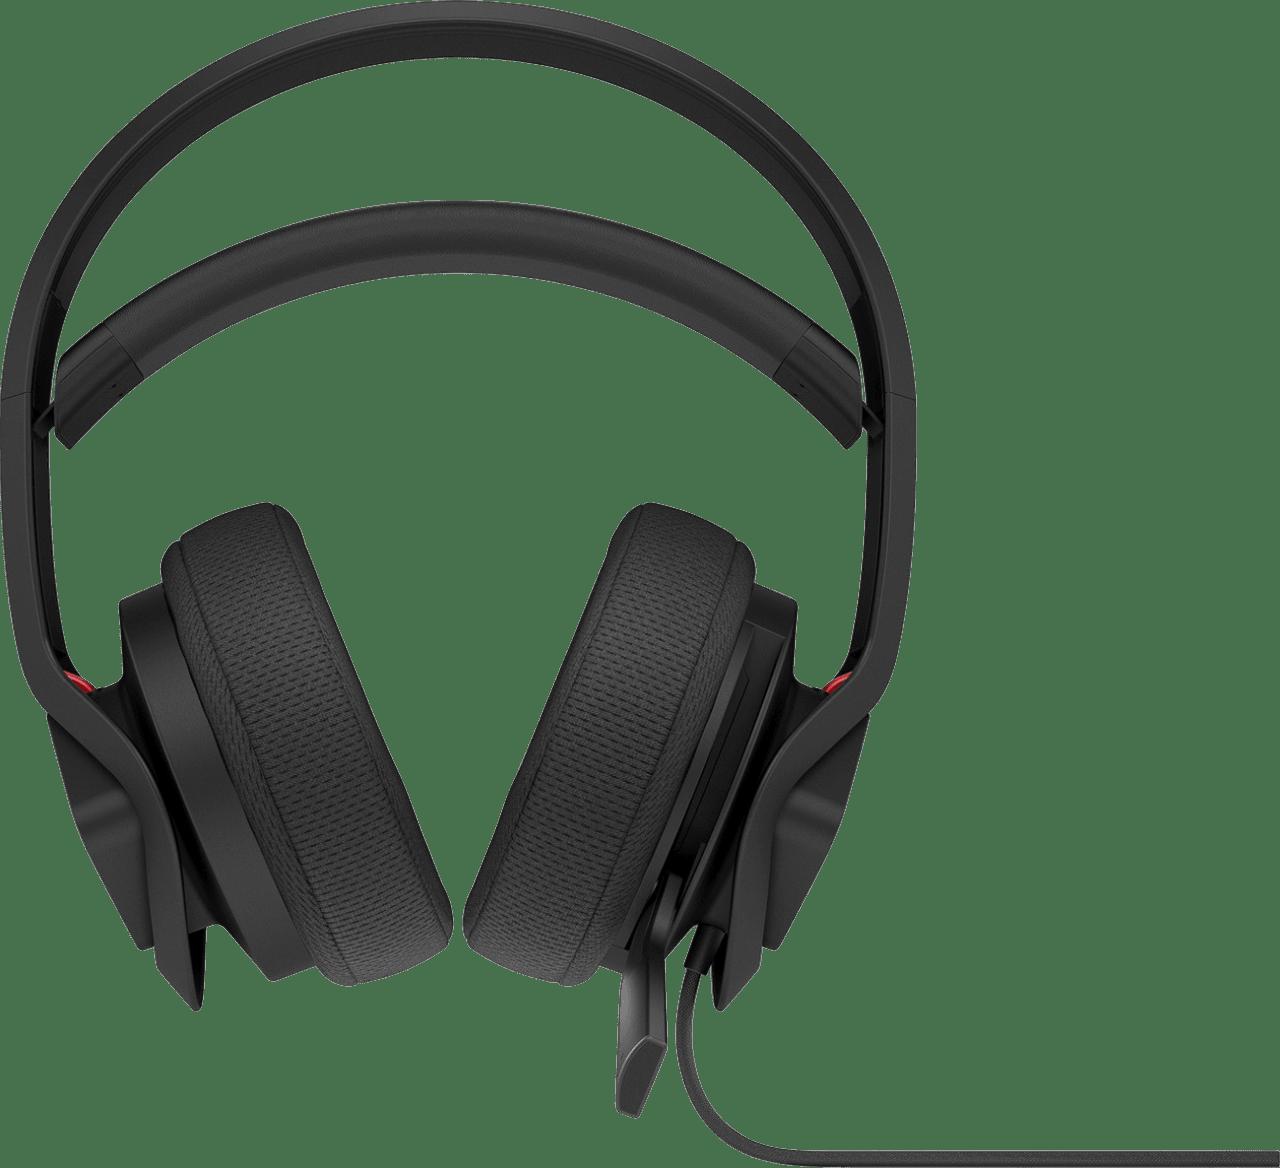 Black HP Omen Mindframe 2 Over-ear Gaming Headphones.2